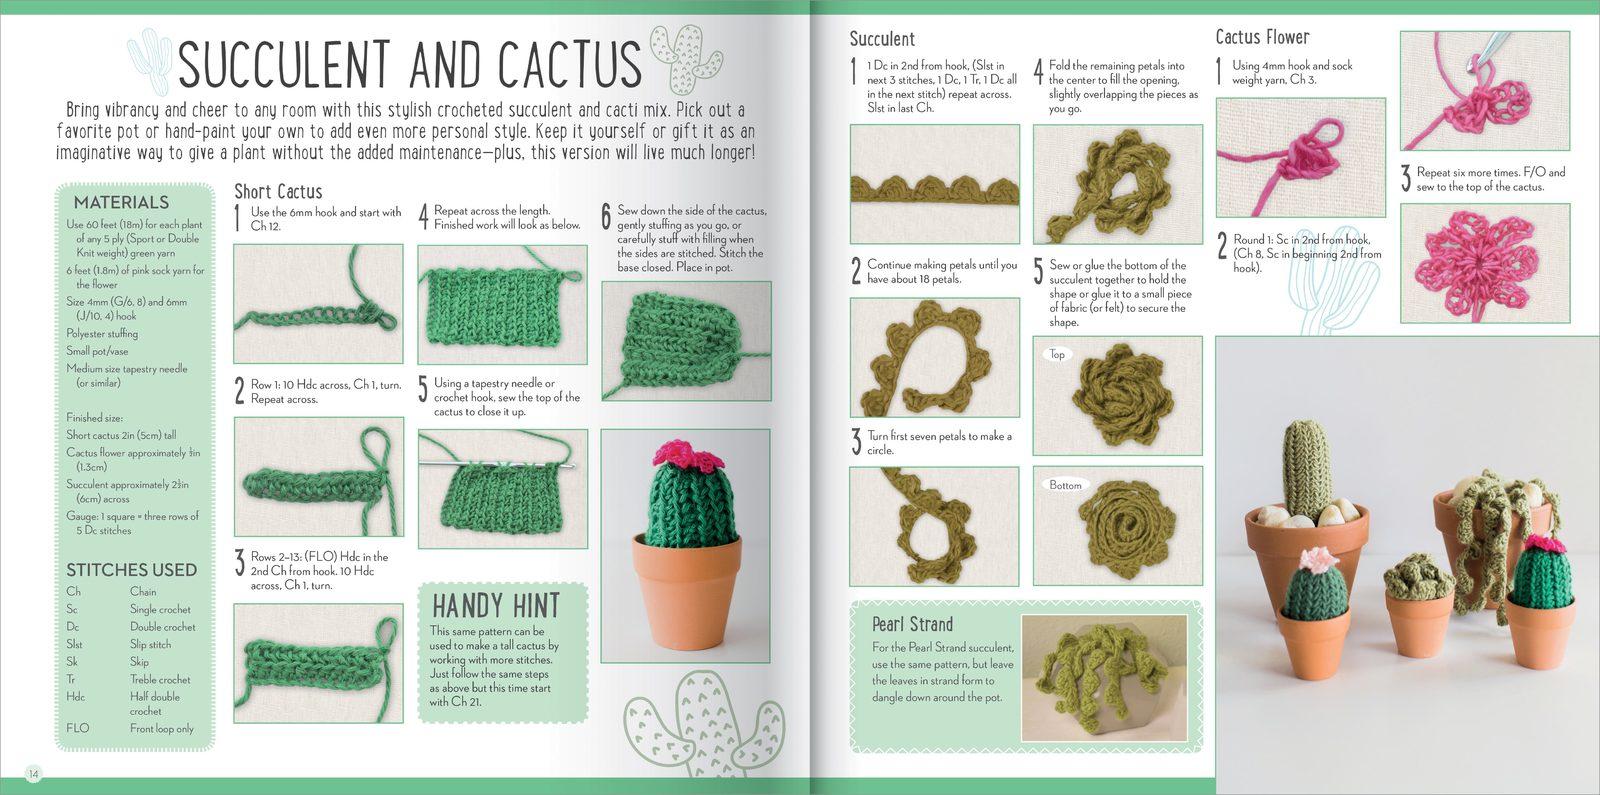 Crochet Creations - Craft Kit image